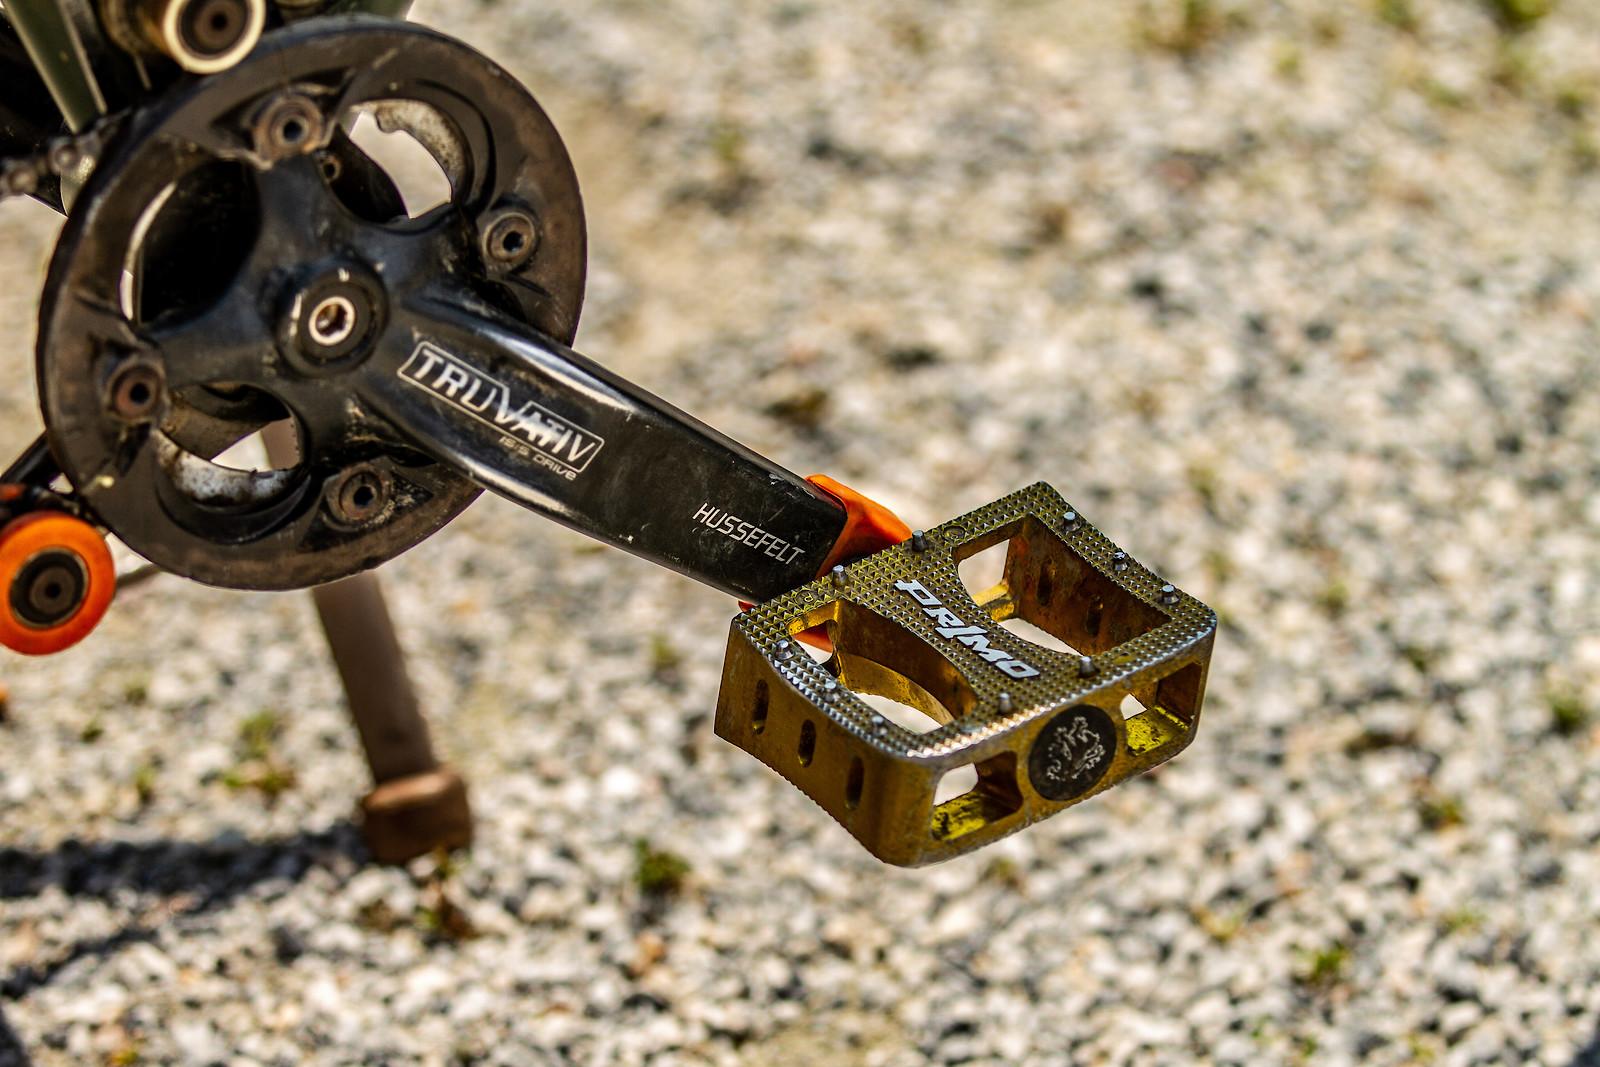 Primo Pedals on Hussefelt Cranks - JackRice - Mountain Biking Pictures - Vital MTB